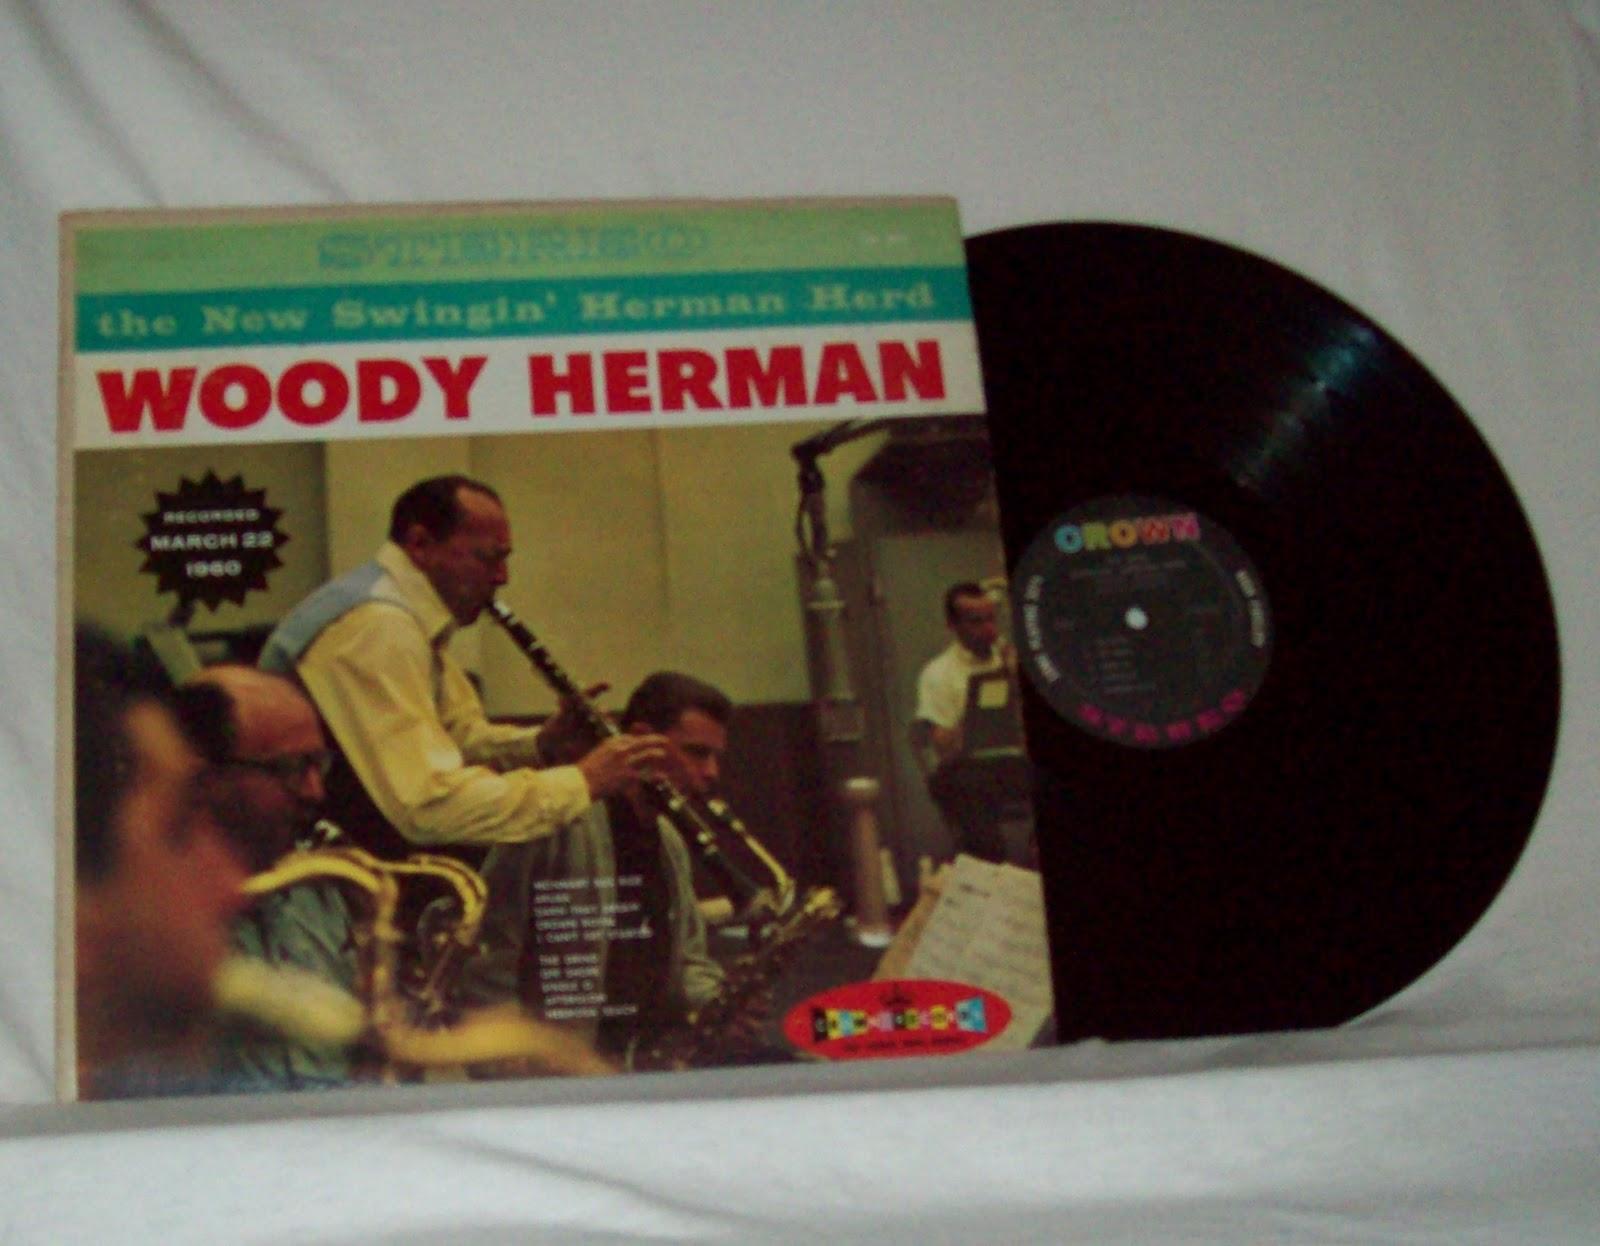 kc music shop woody herman the new swingin herman herd jazz vinyl lp for sale. Black Bedroom Furniture Sets. Home Design Ideas